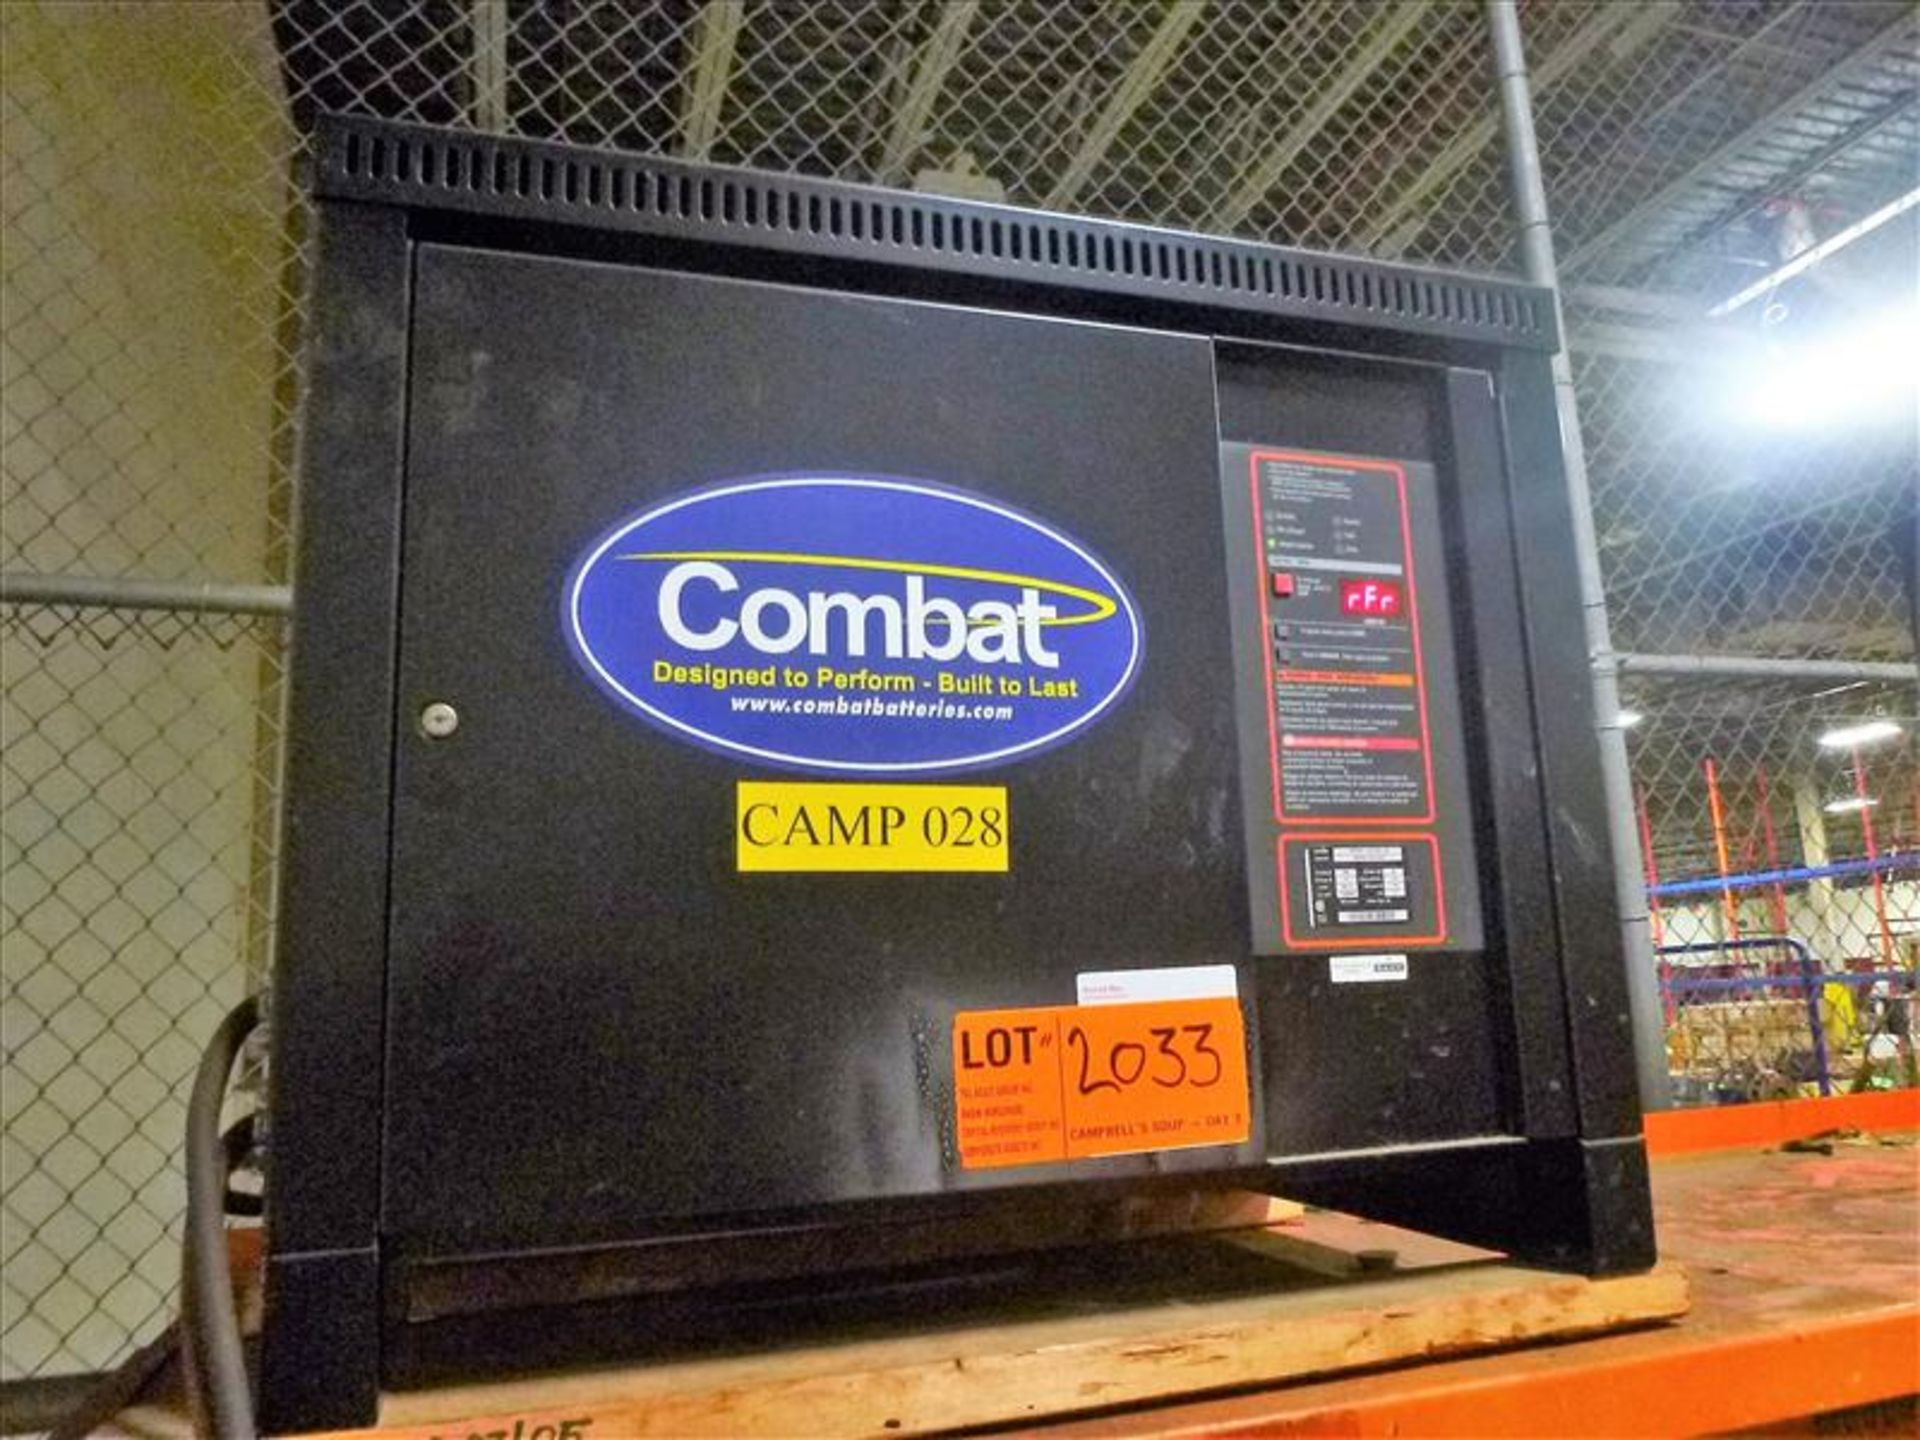 Lot 2033 - Combat battery charger, 48V [Material Handling]